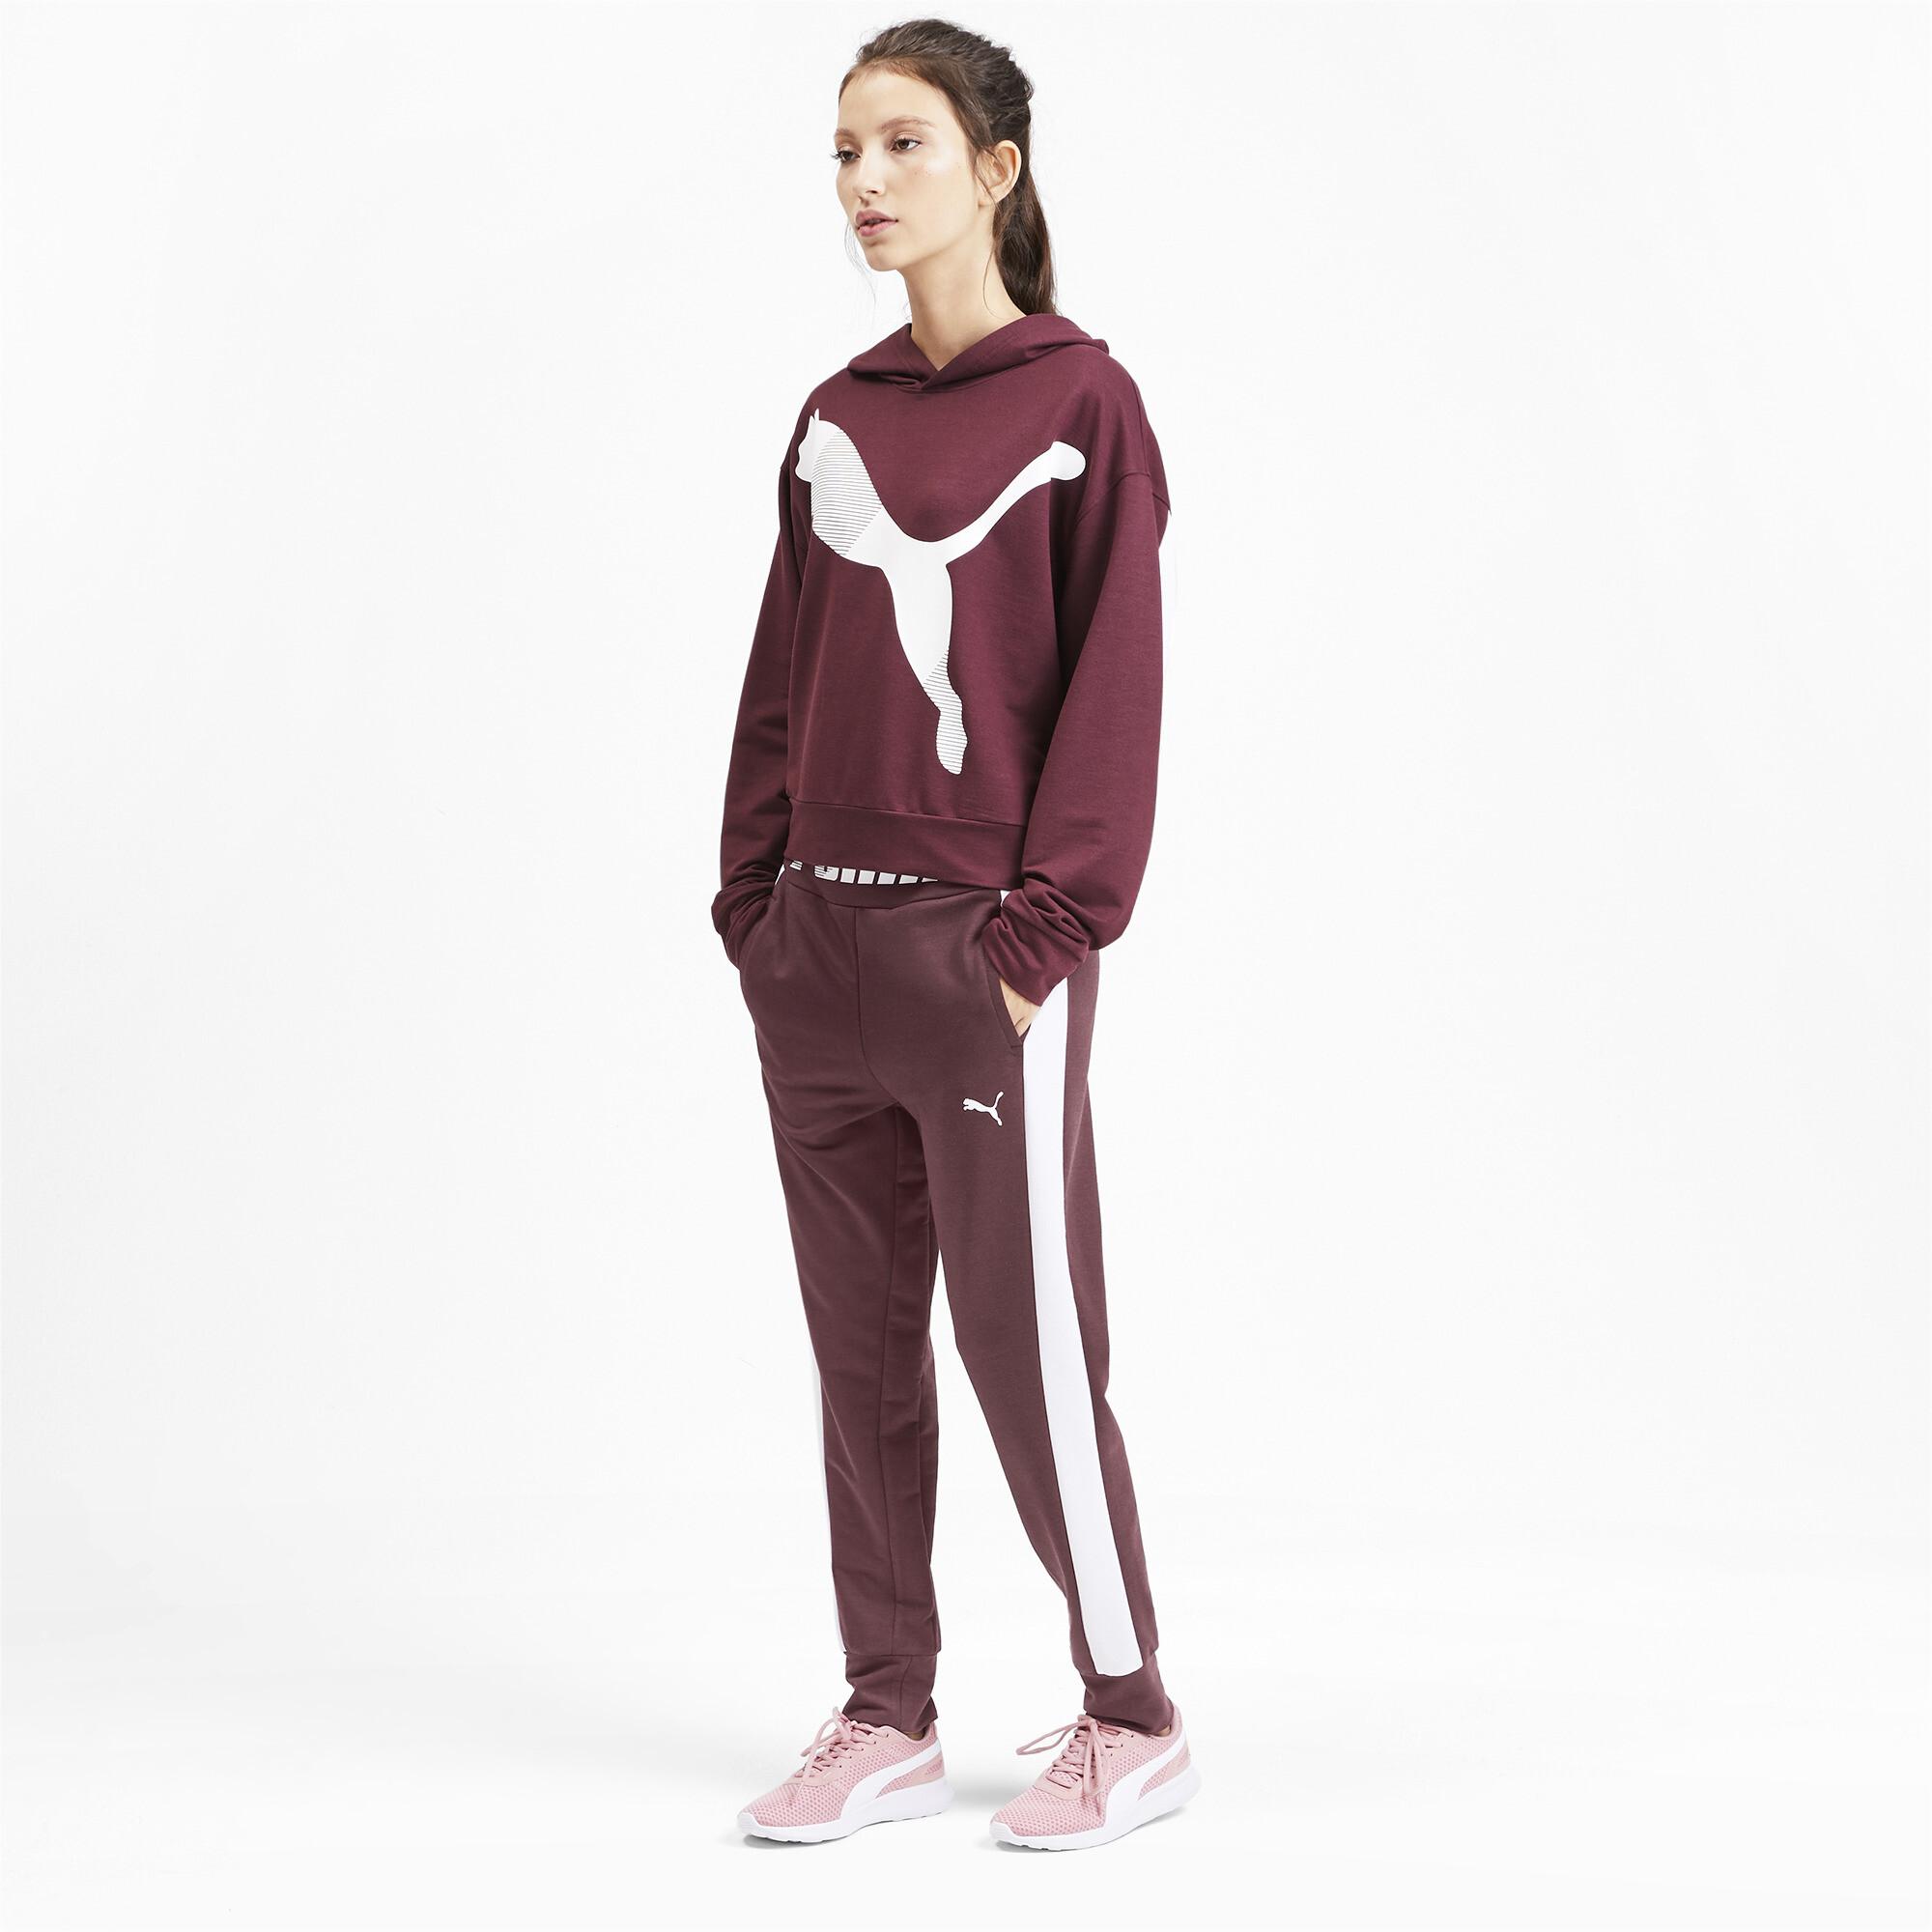 PUMA-Modern-Sports-Women-039-s-Track-Pants-Women-Knitted-Pants-Basics thumbnail 6